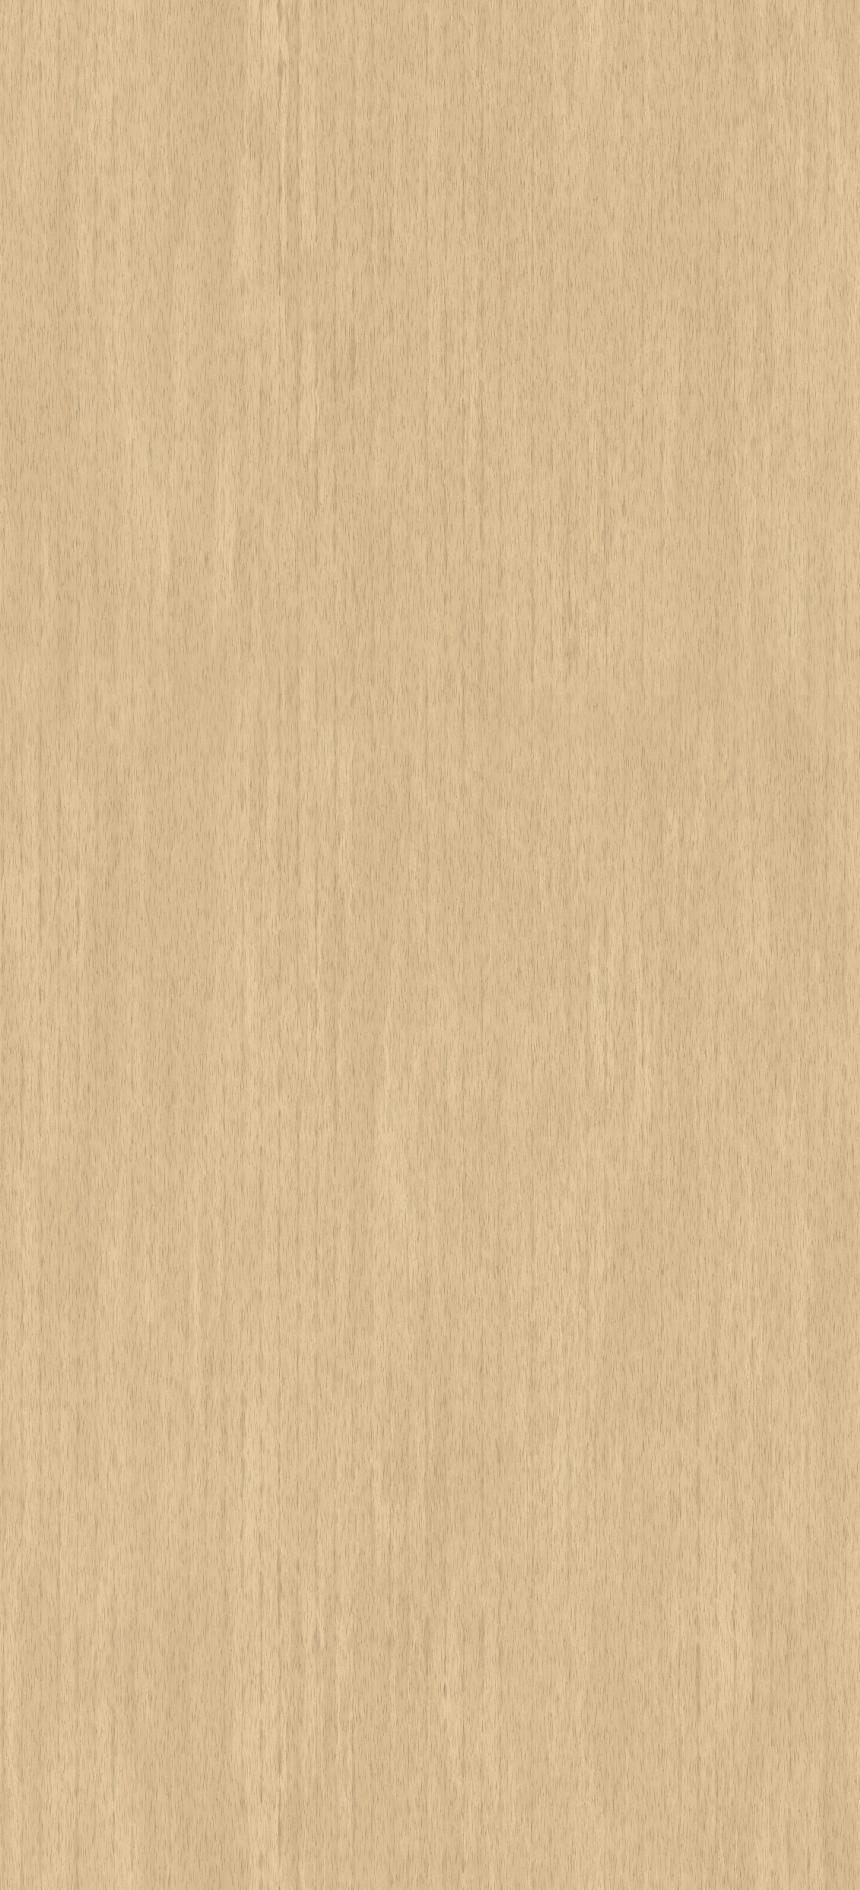 wood art wallpaper